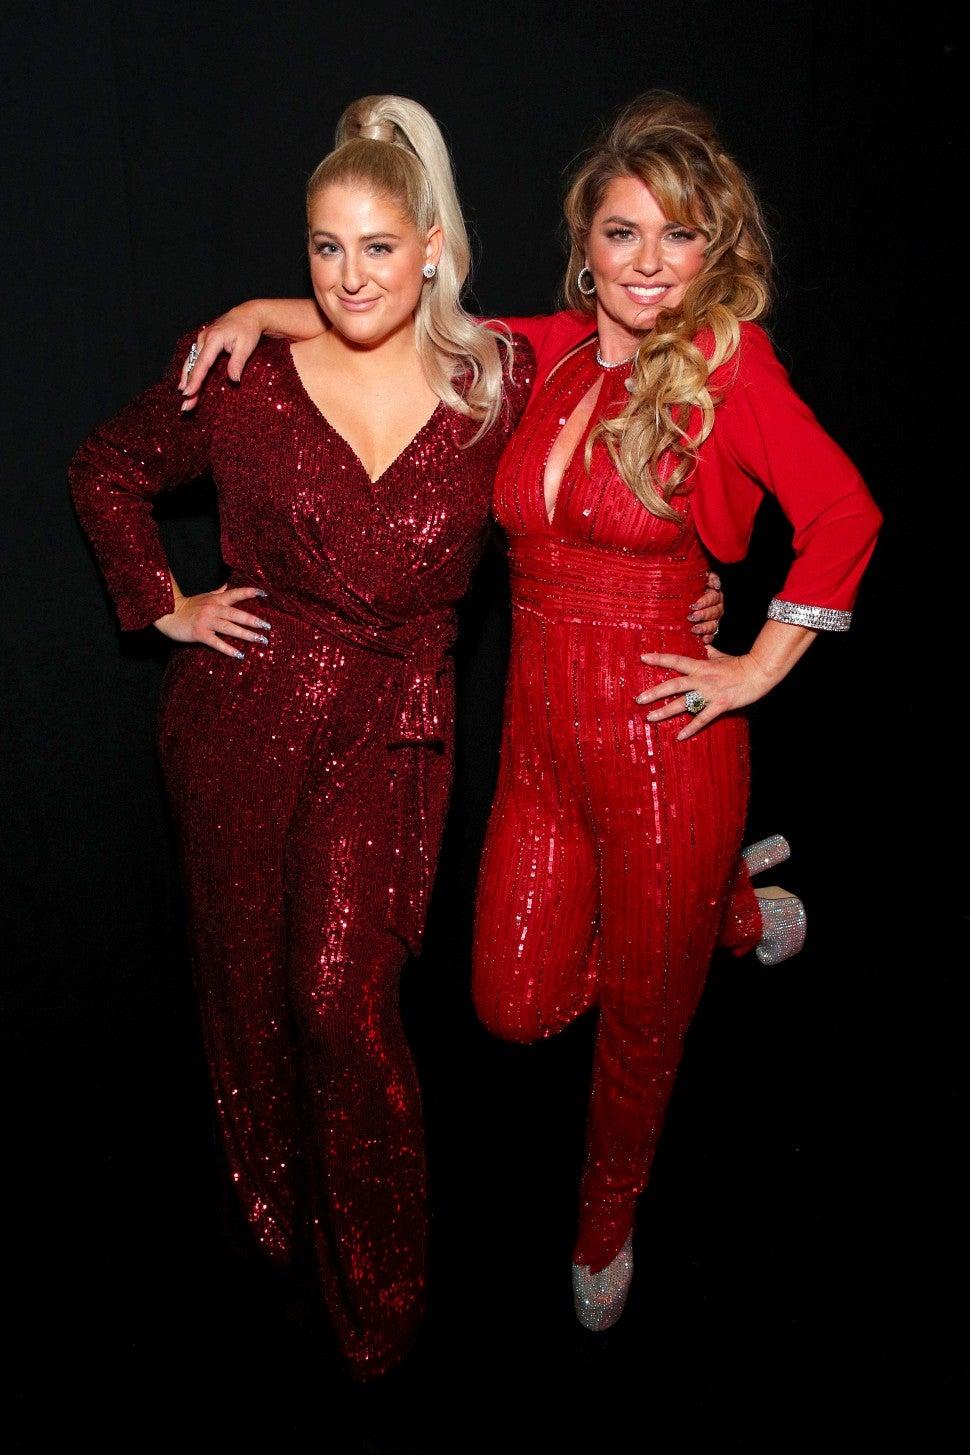 Meghan Trainor and Shania Twain